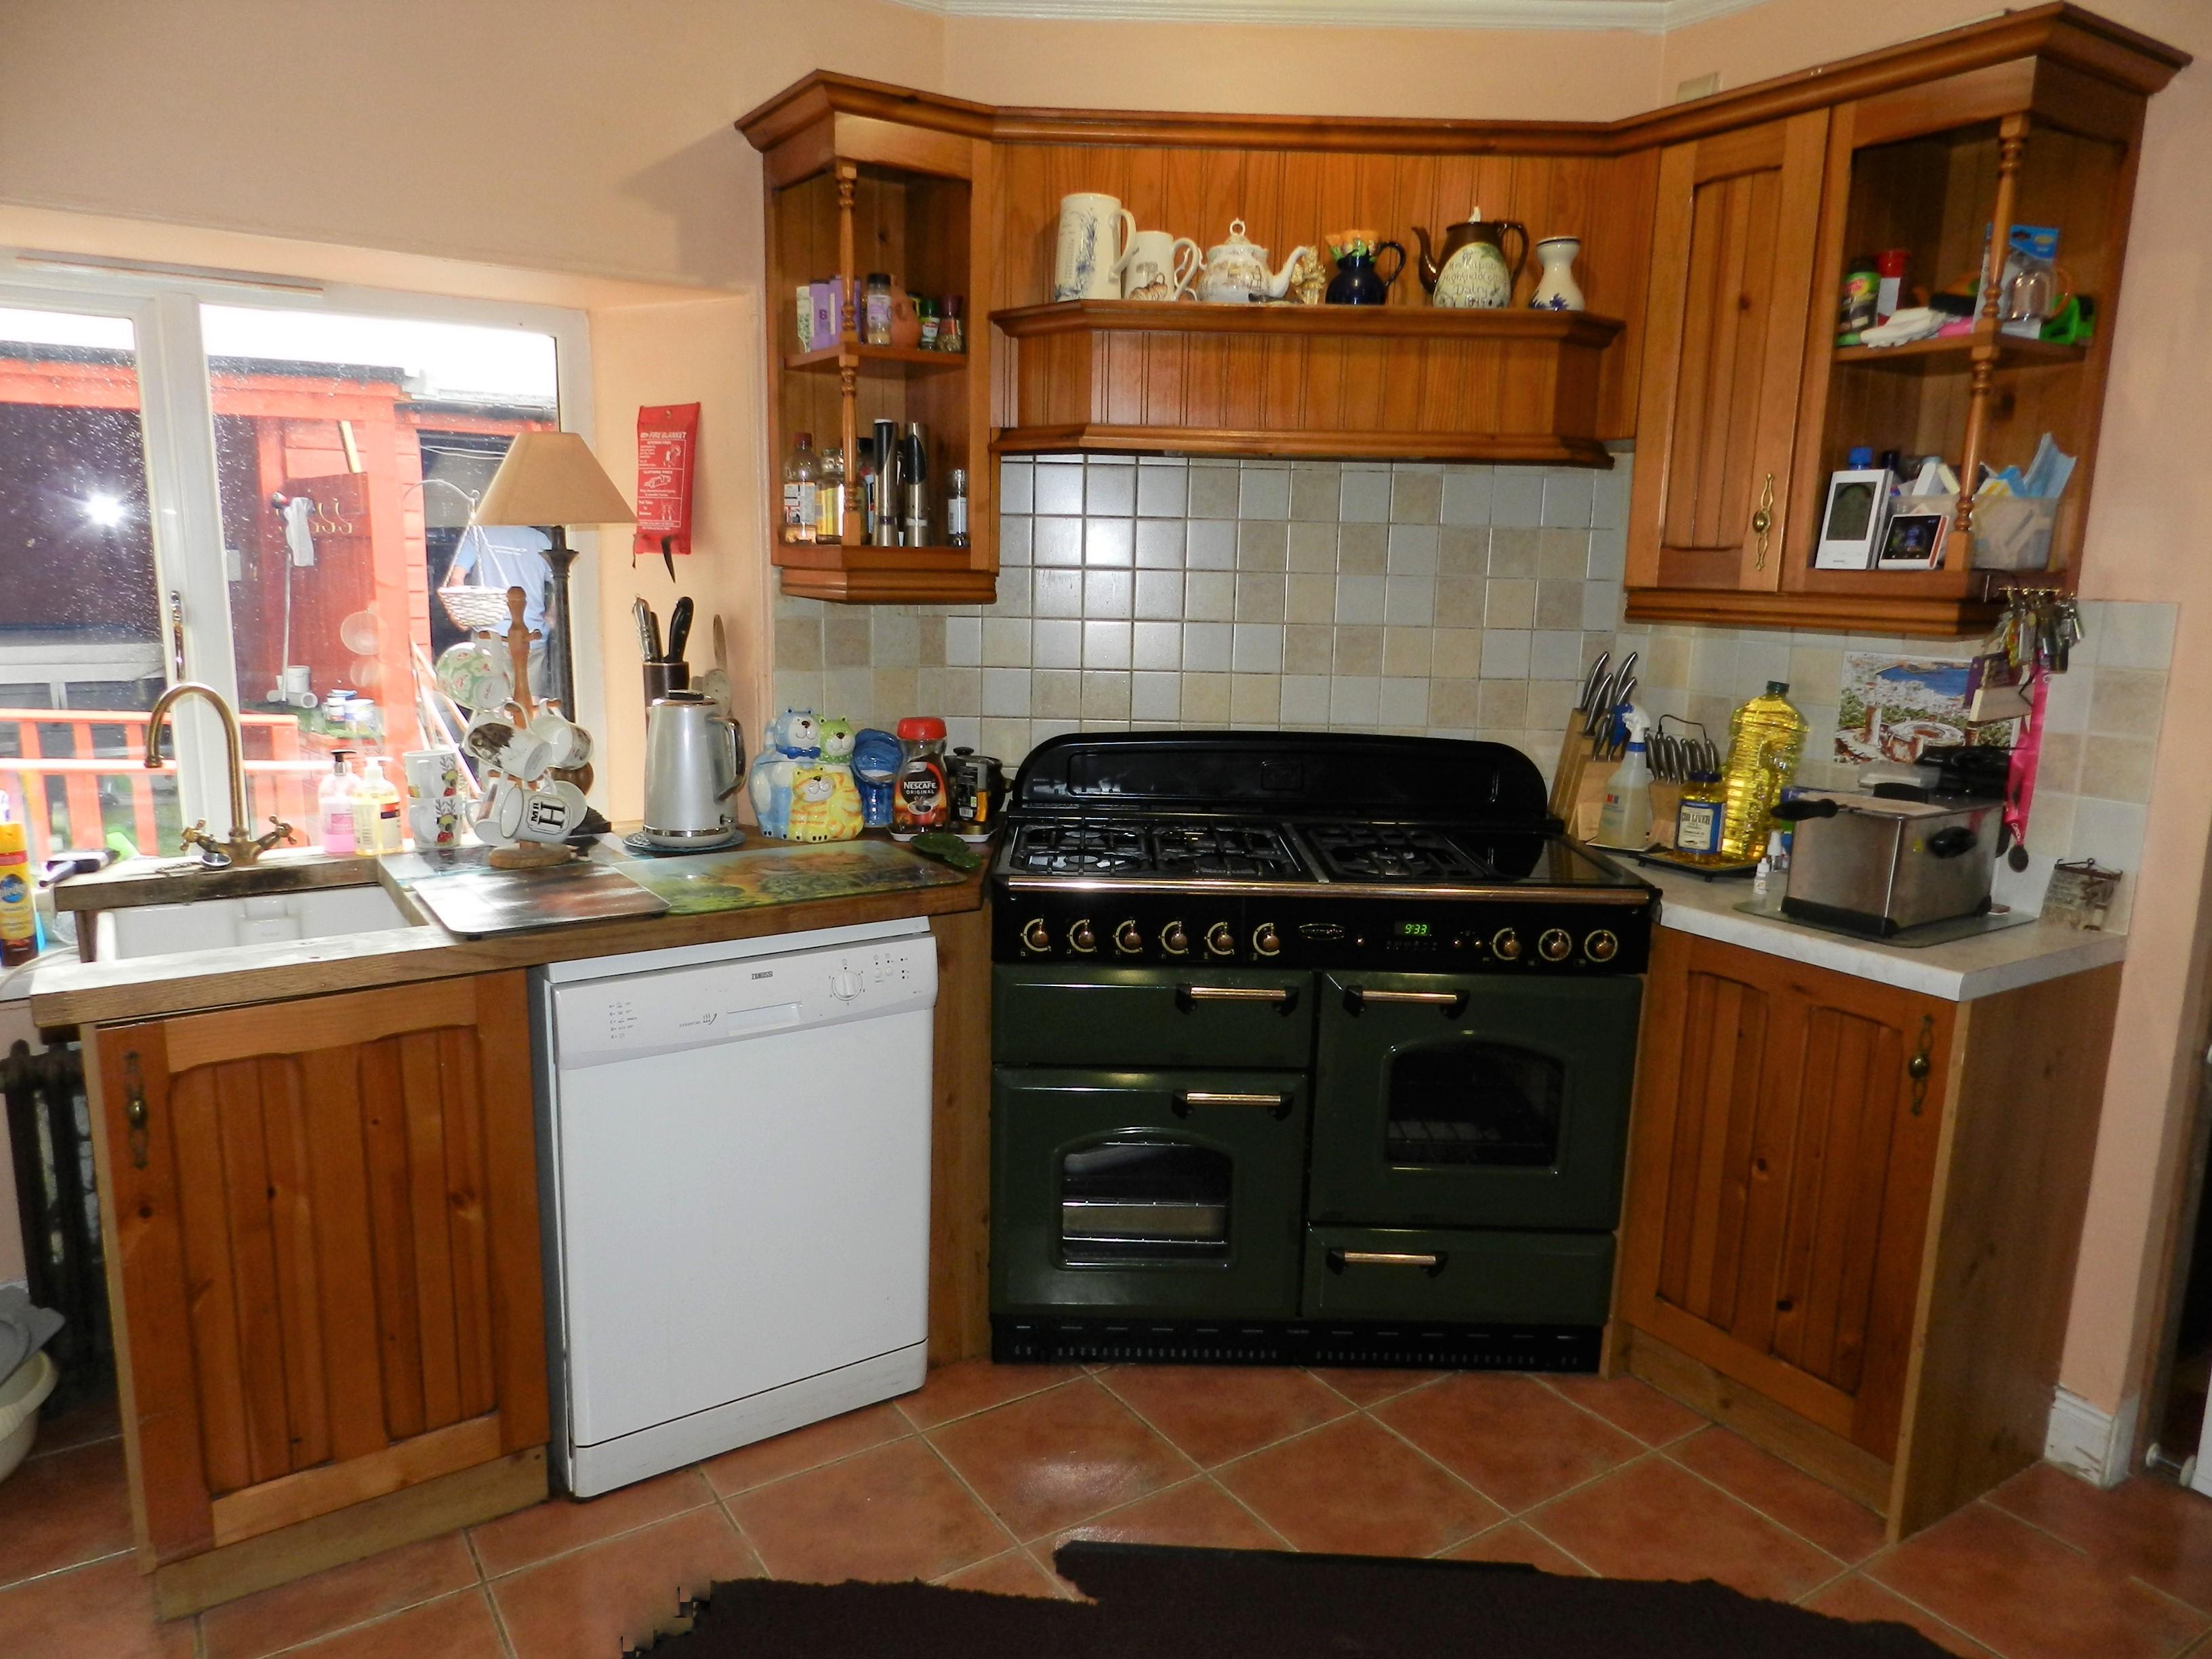 stmichael_kitchen2.jpg